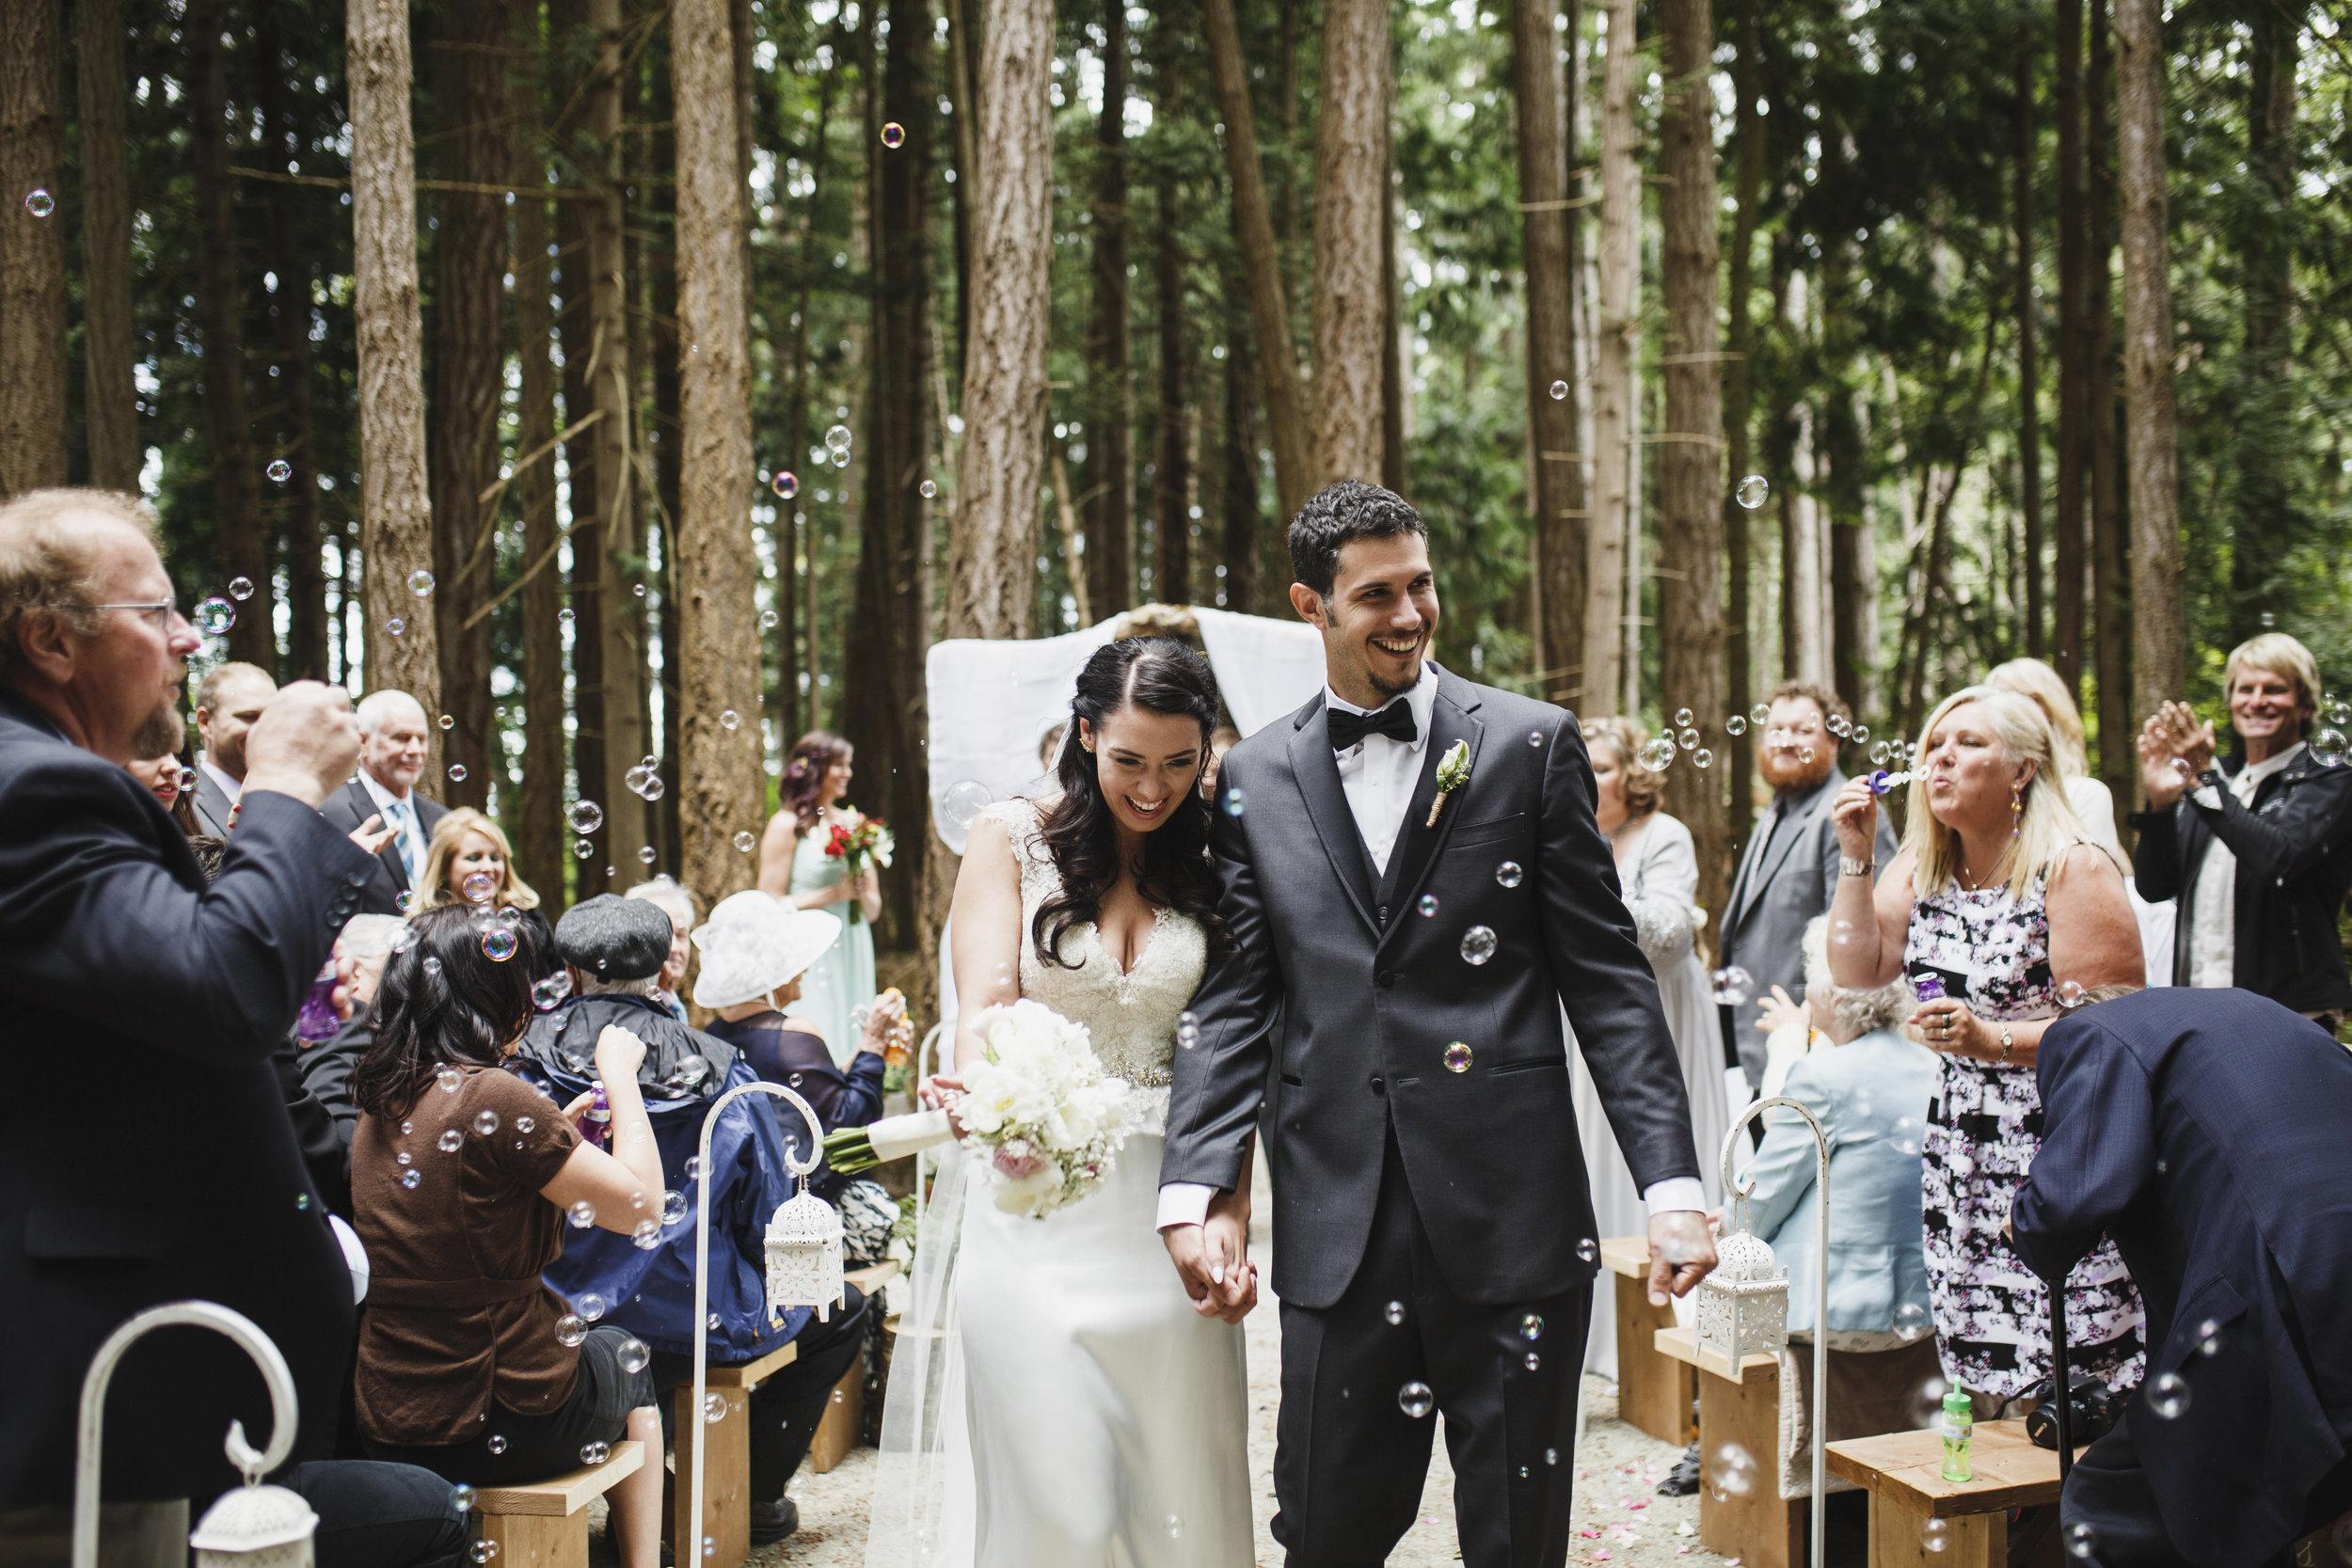 Everyone congratulates the Bride and the Groom Forest wedding Tofino Sea Cider Vancouver Island